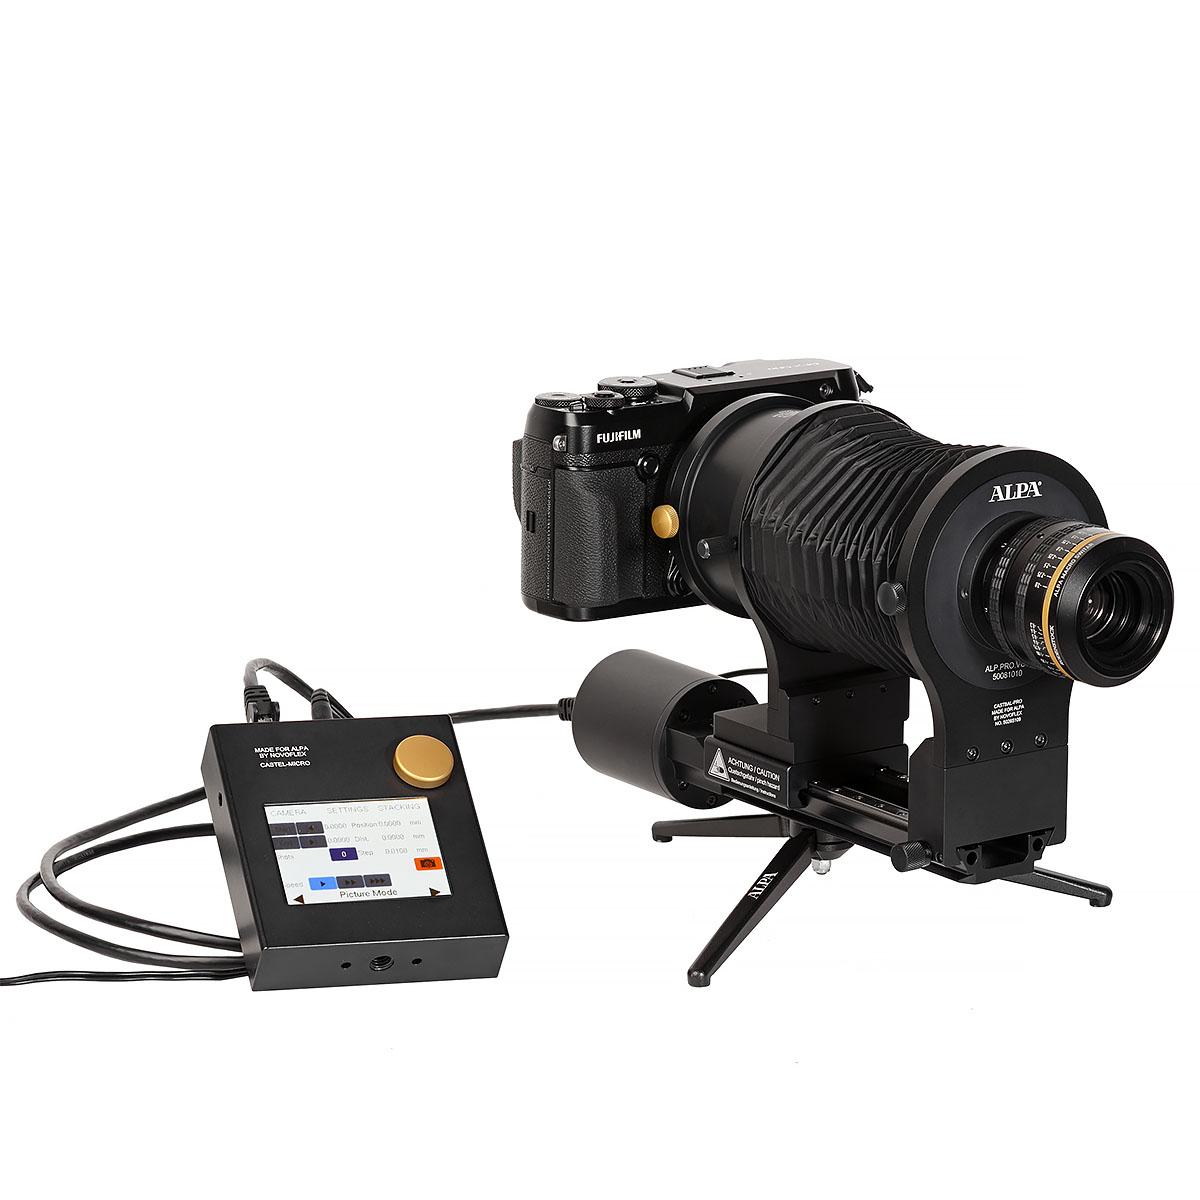 Introducing ALPA Adapter Fujifilm GFX Bodies on ALPA Bellows